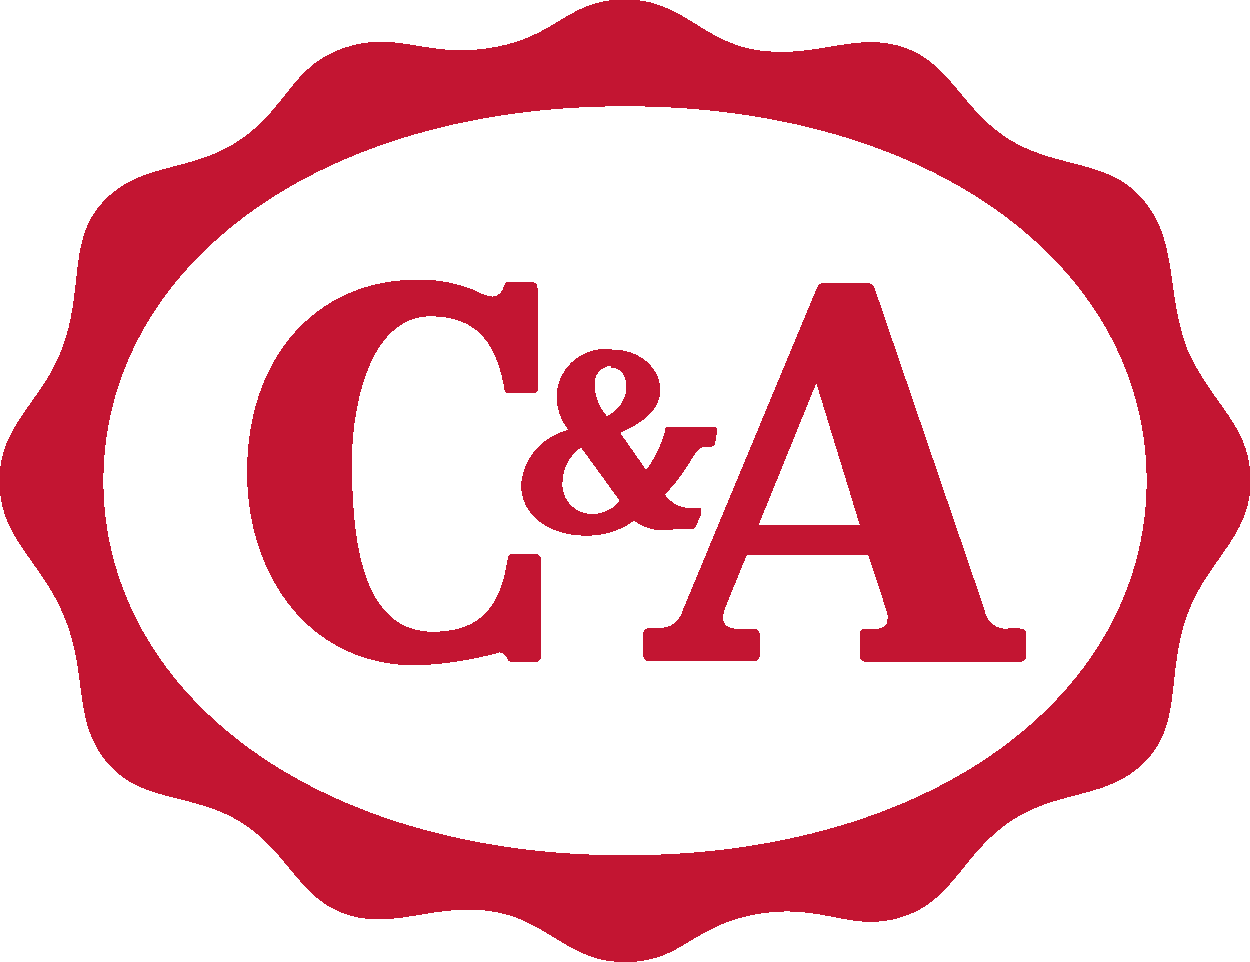 C&A Logo png